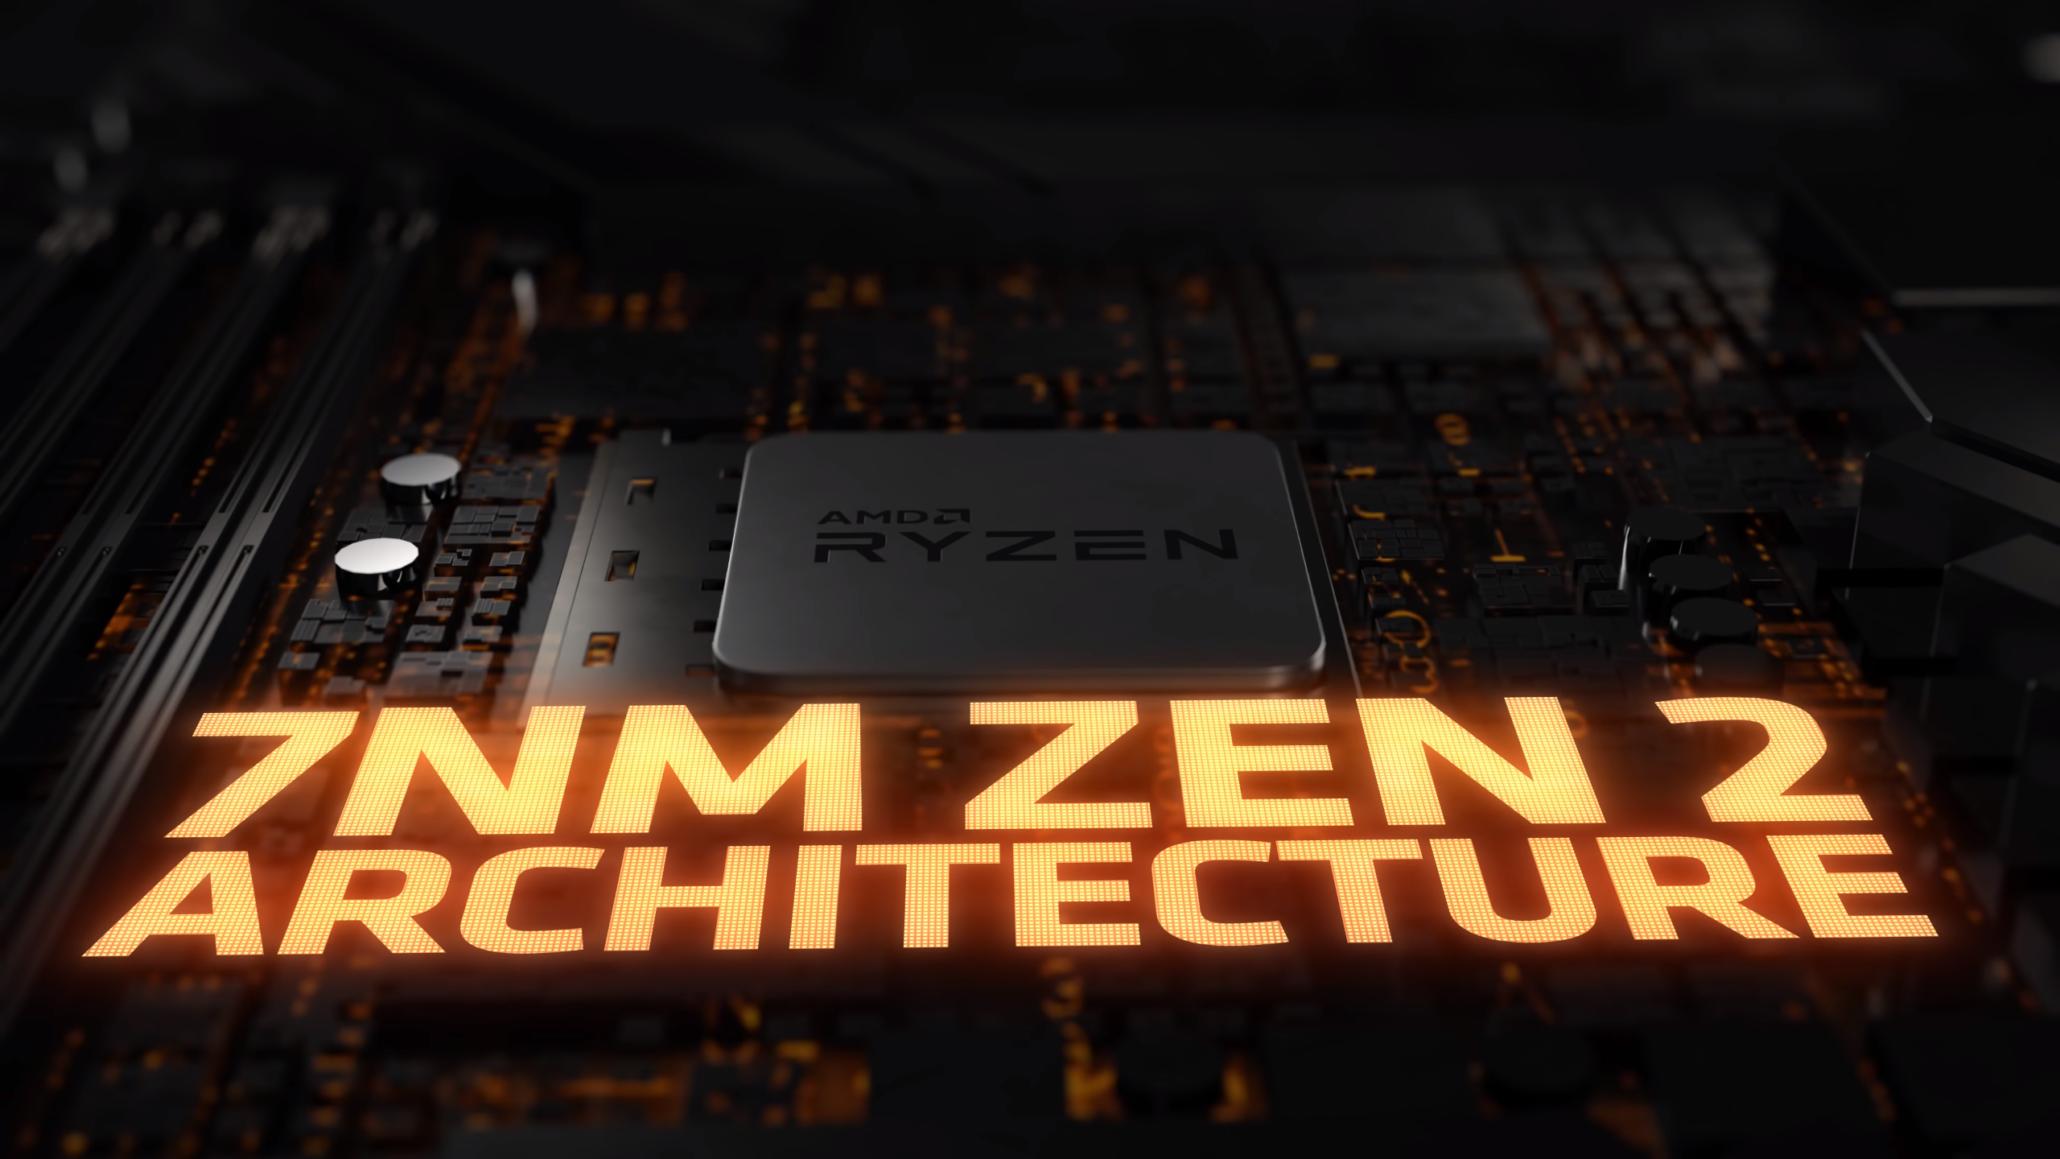 AMD Ryzen 9 3900X 12 Core & Ryzen 7 3700X 8 Core CPU Benchmarks Leak Out